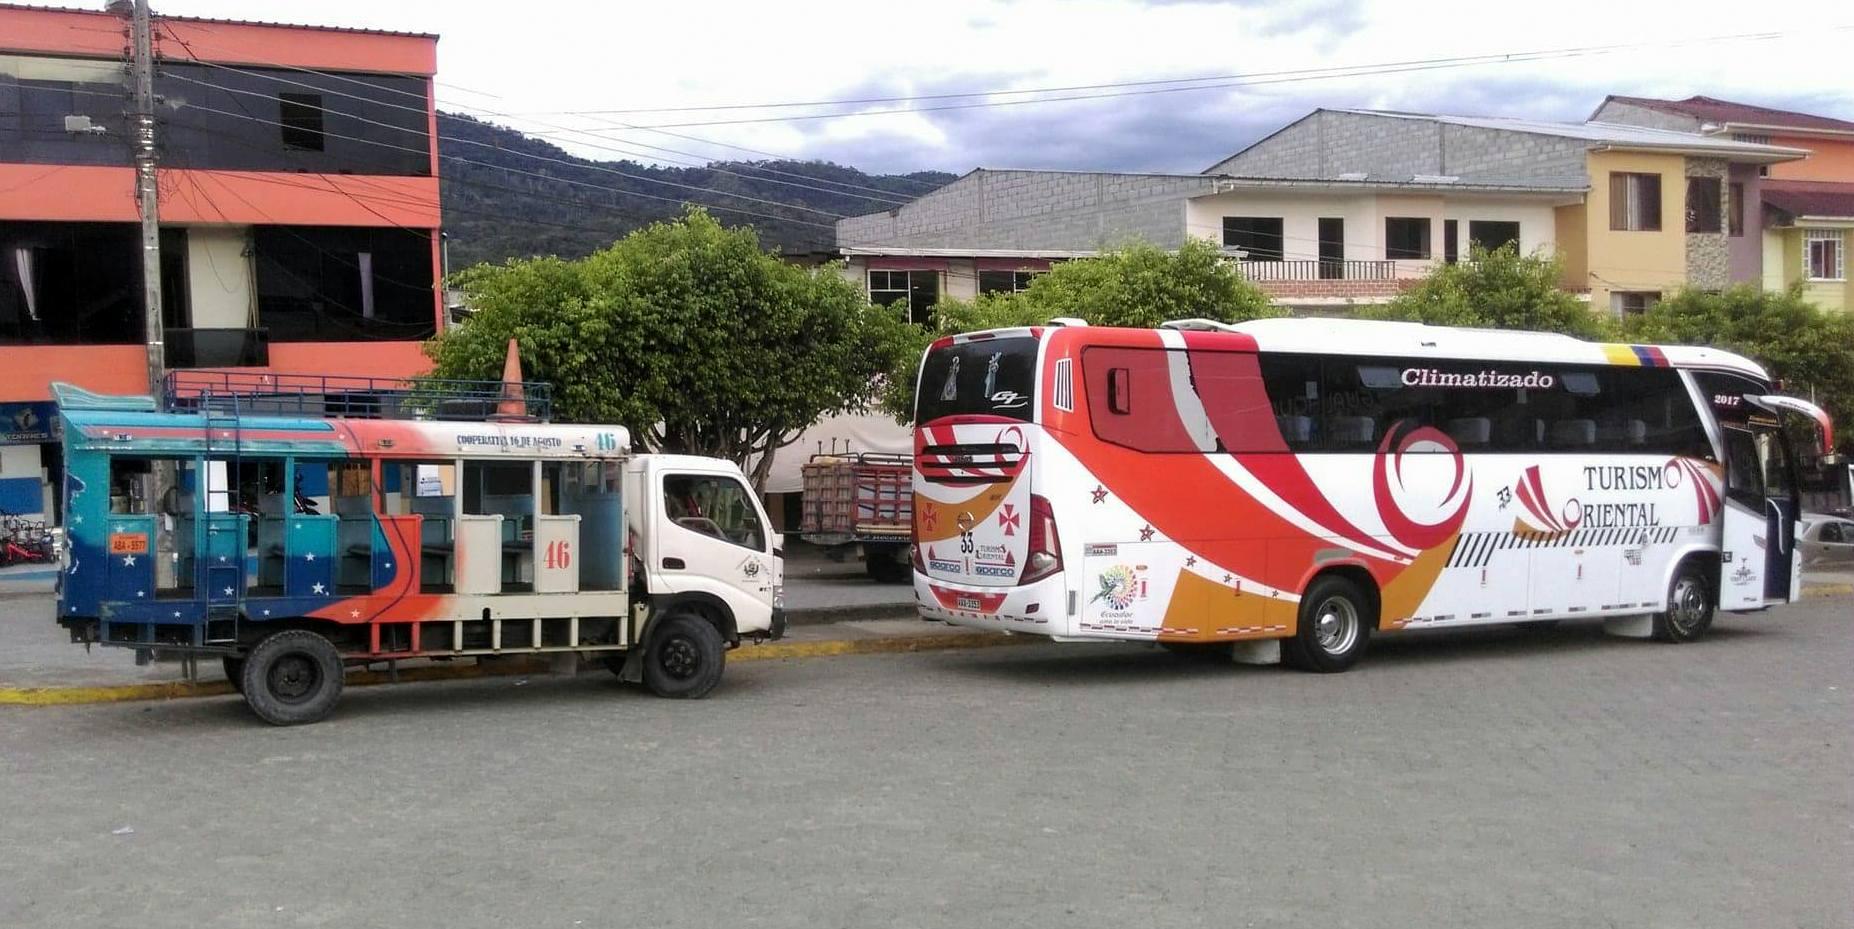 Ecuador by bus